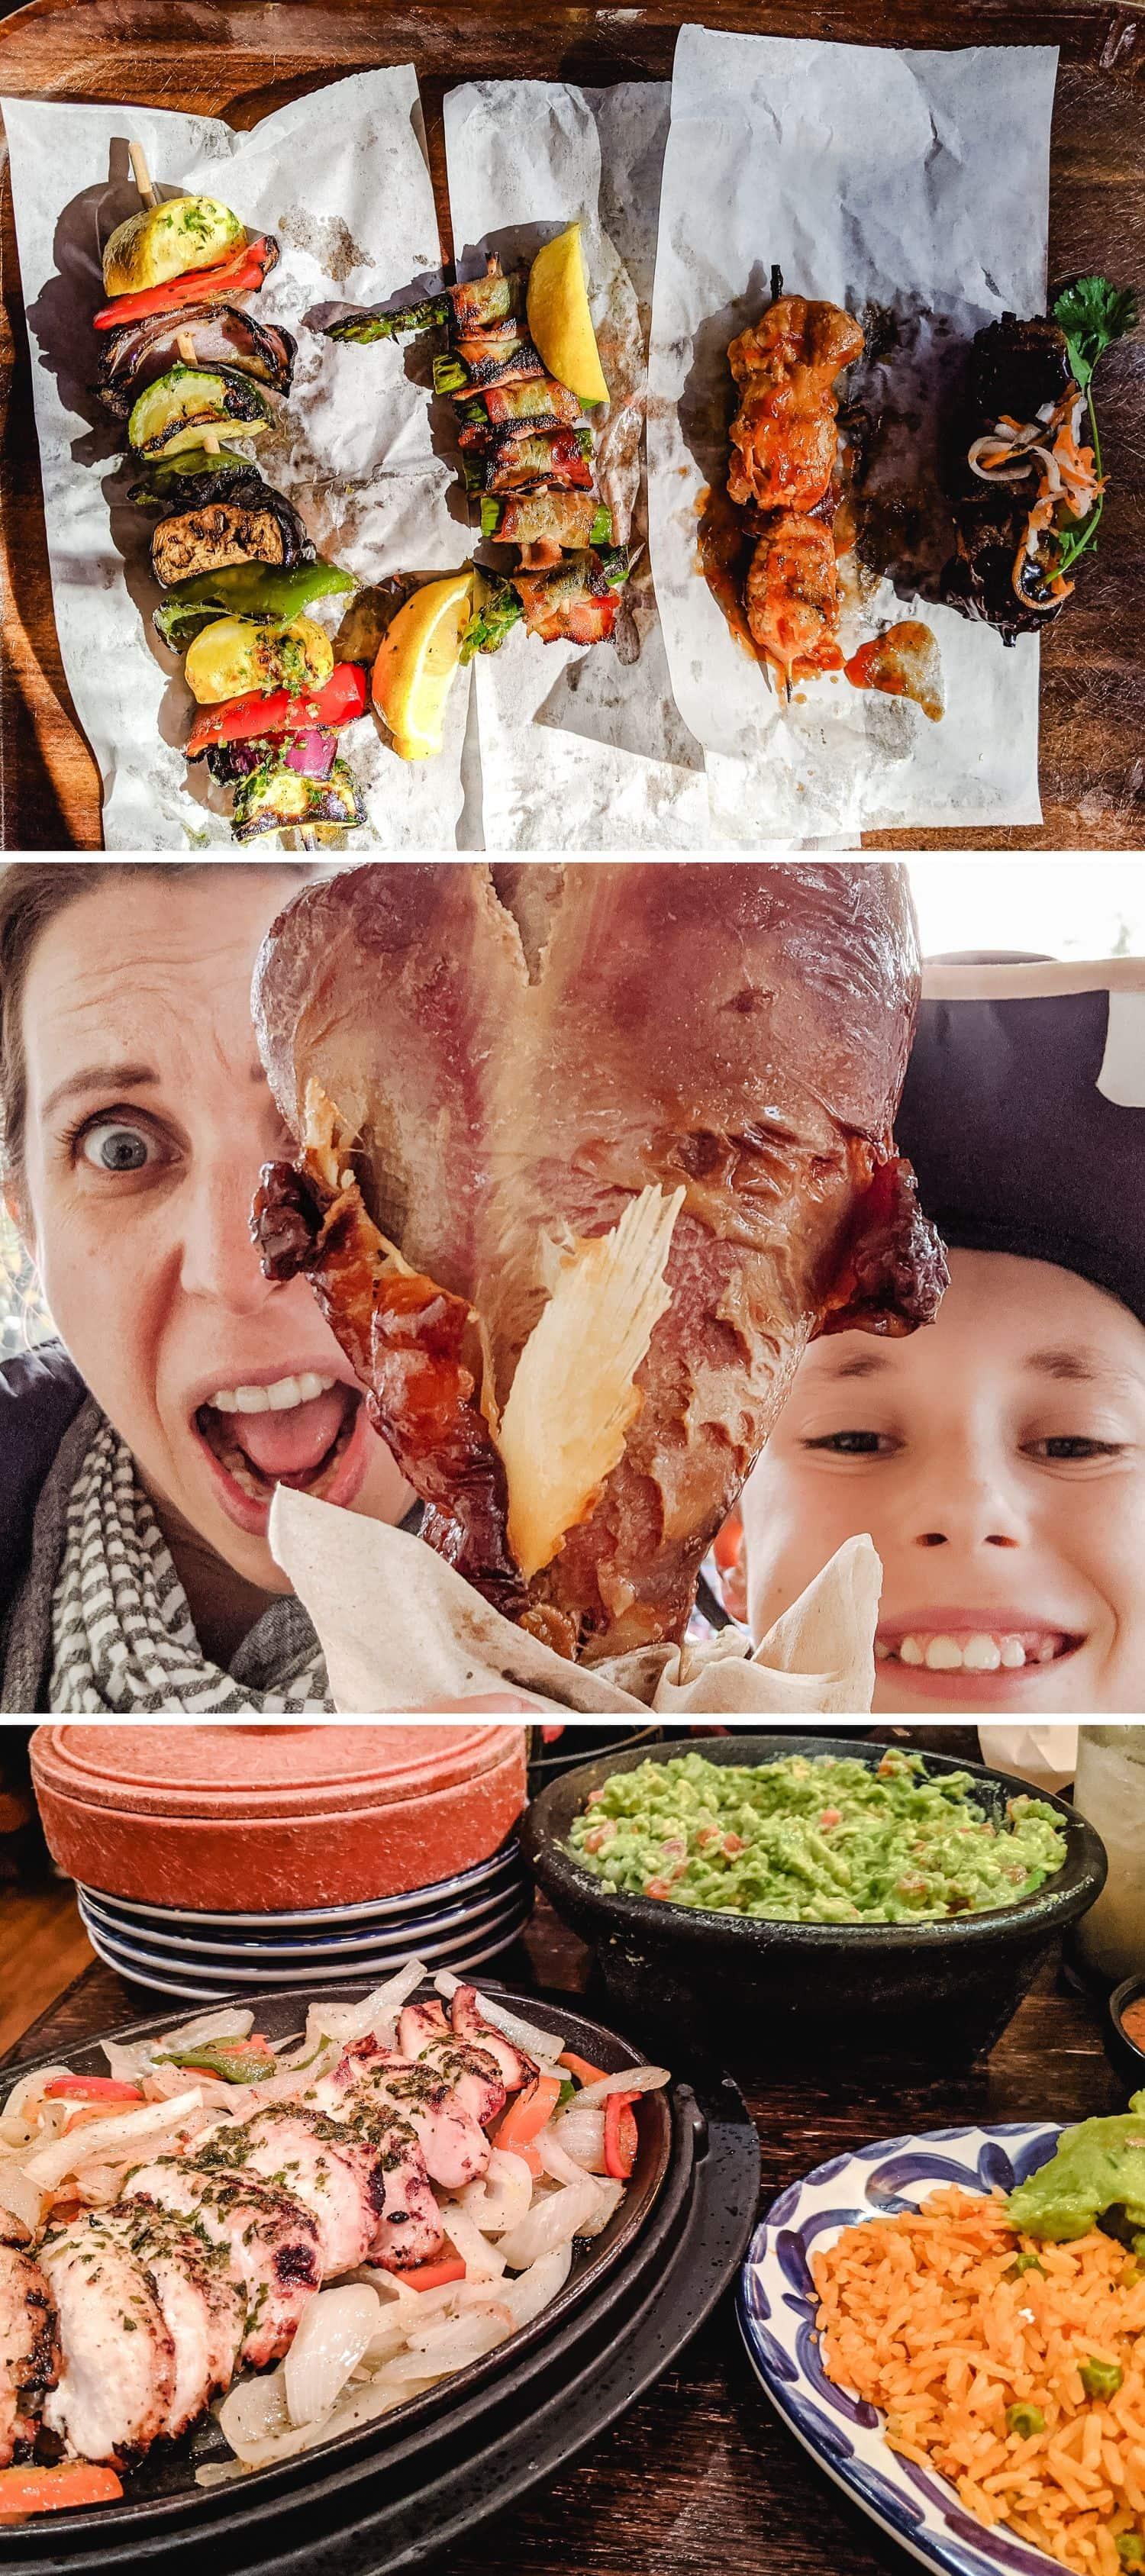 Collage of Disneyland food